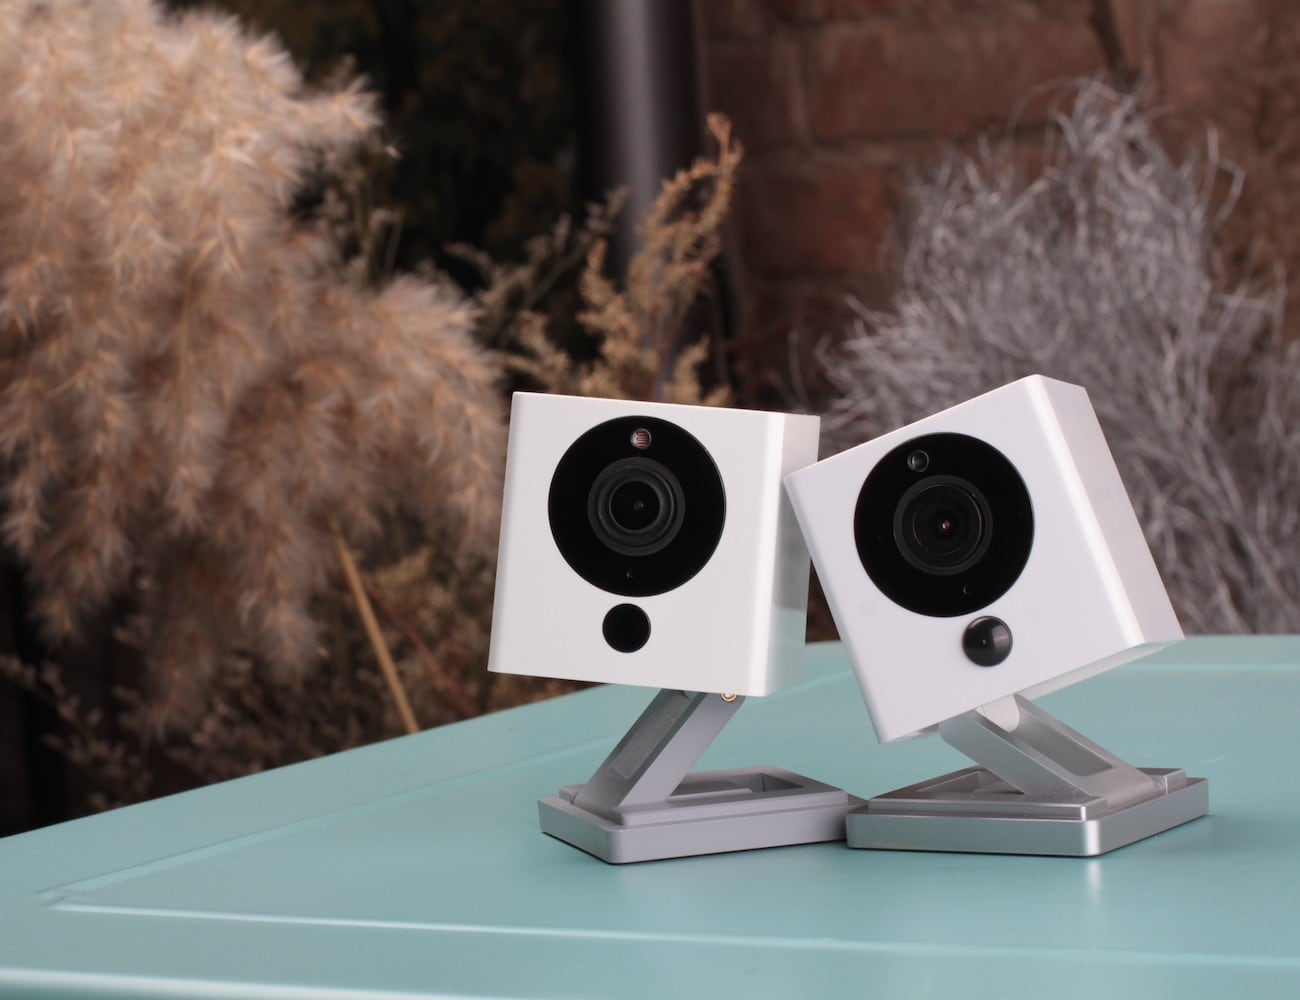 Neos SmartCam Full HD Smart Security Camera